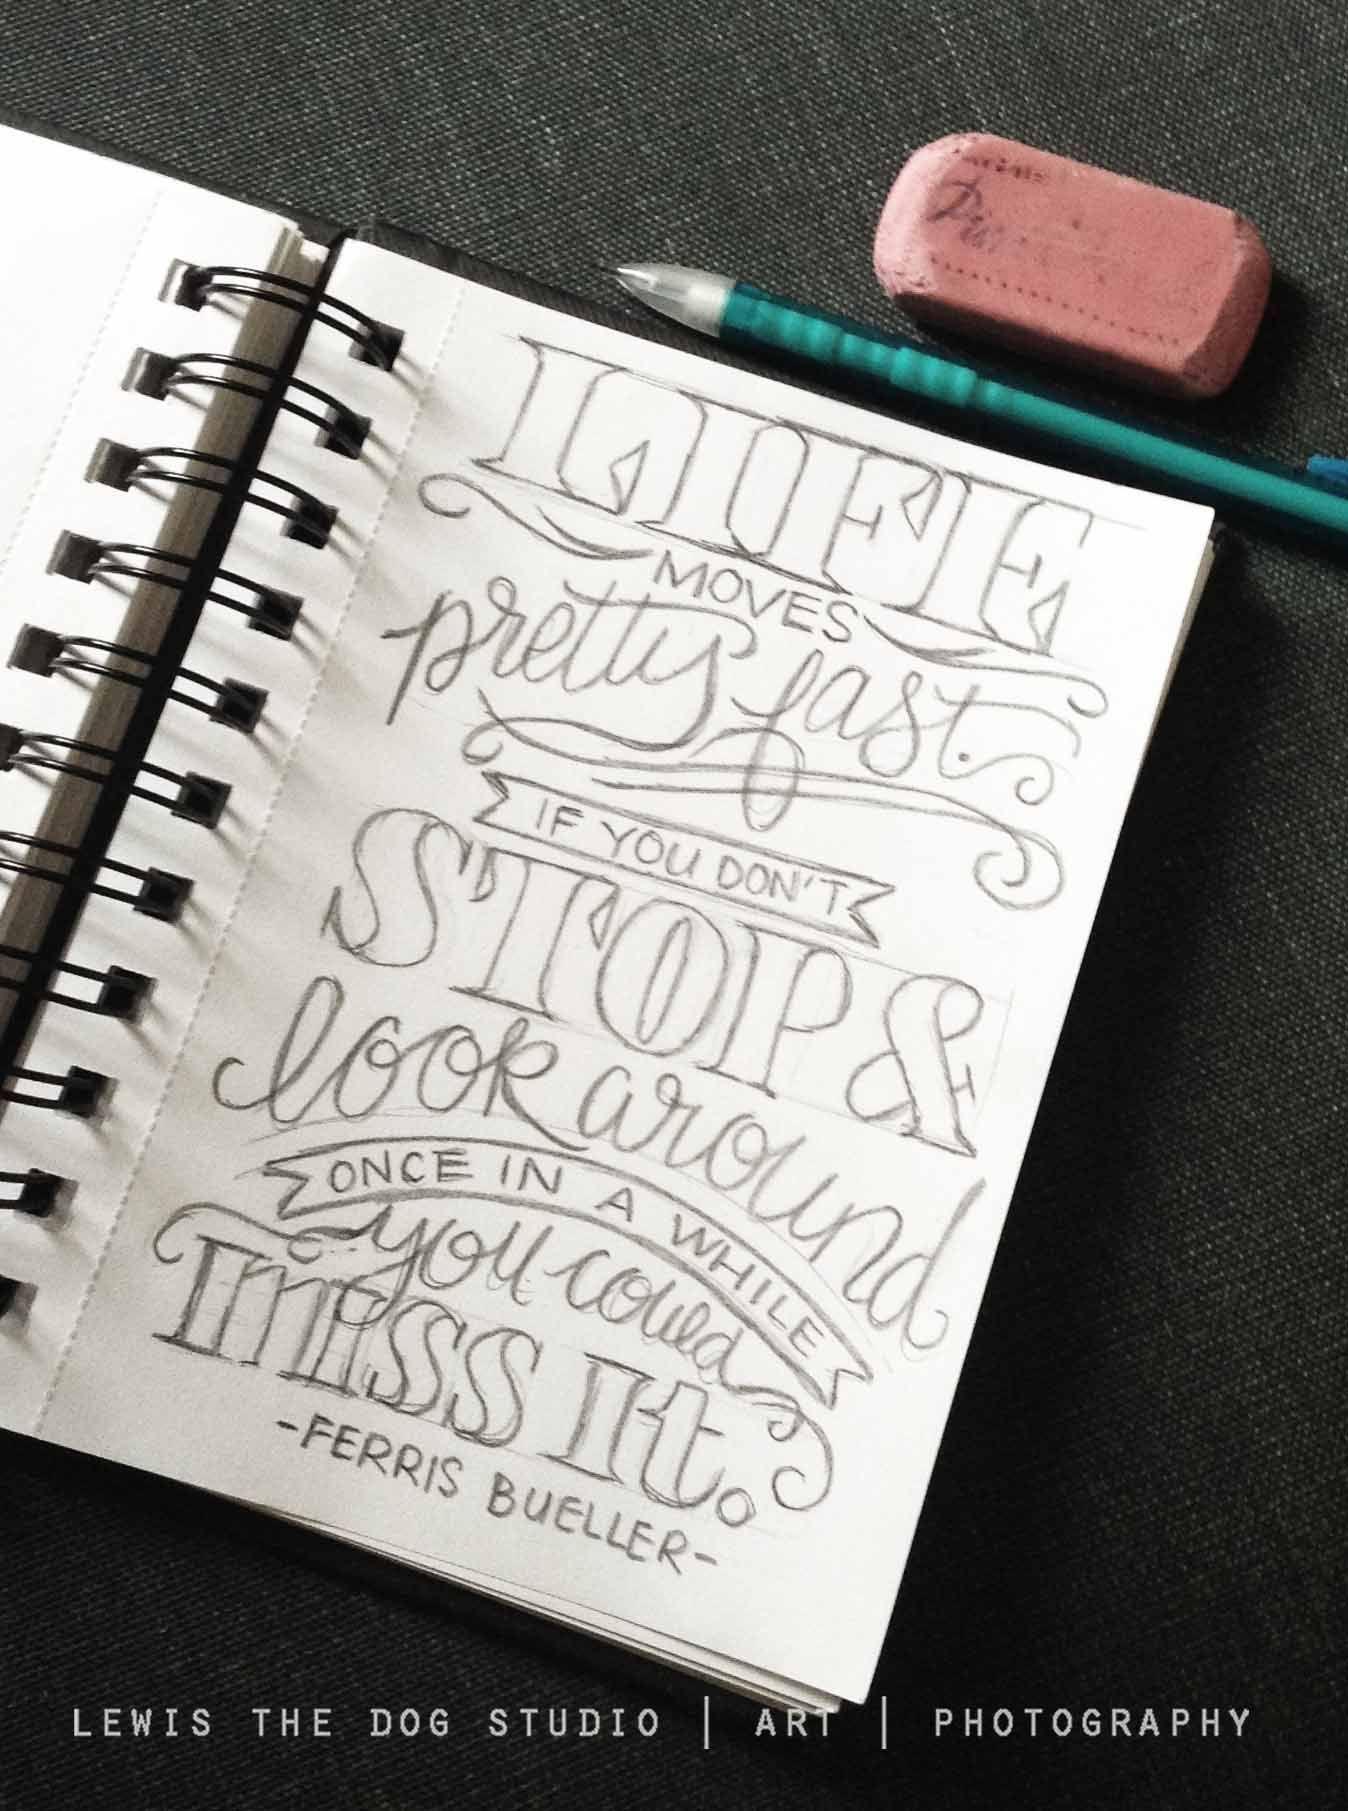 4x6 pencil sketch quote by emma vande voort instagram lewisthedogstudio